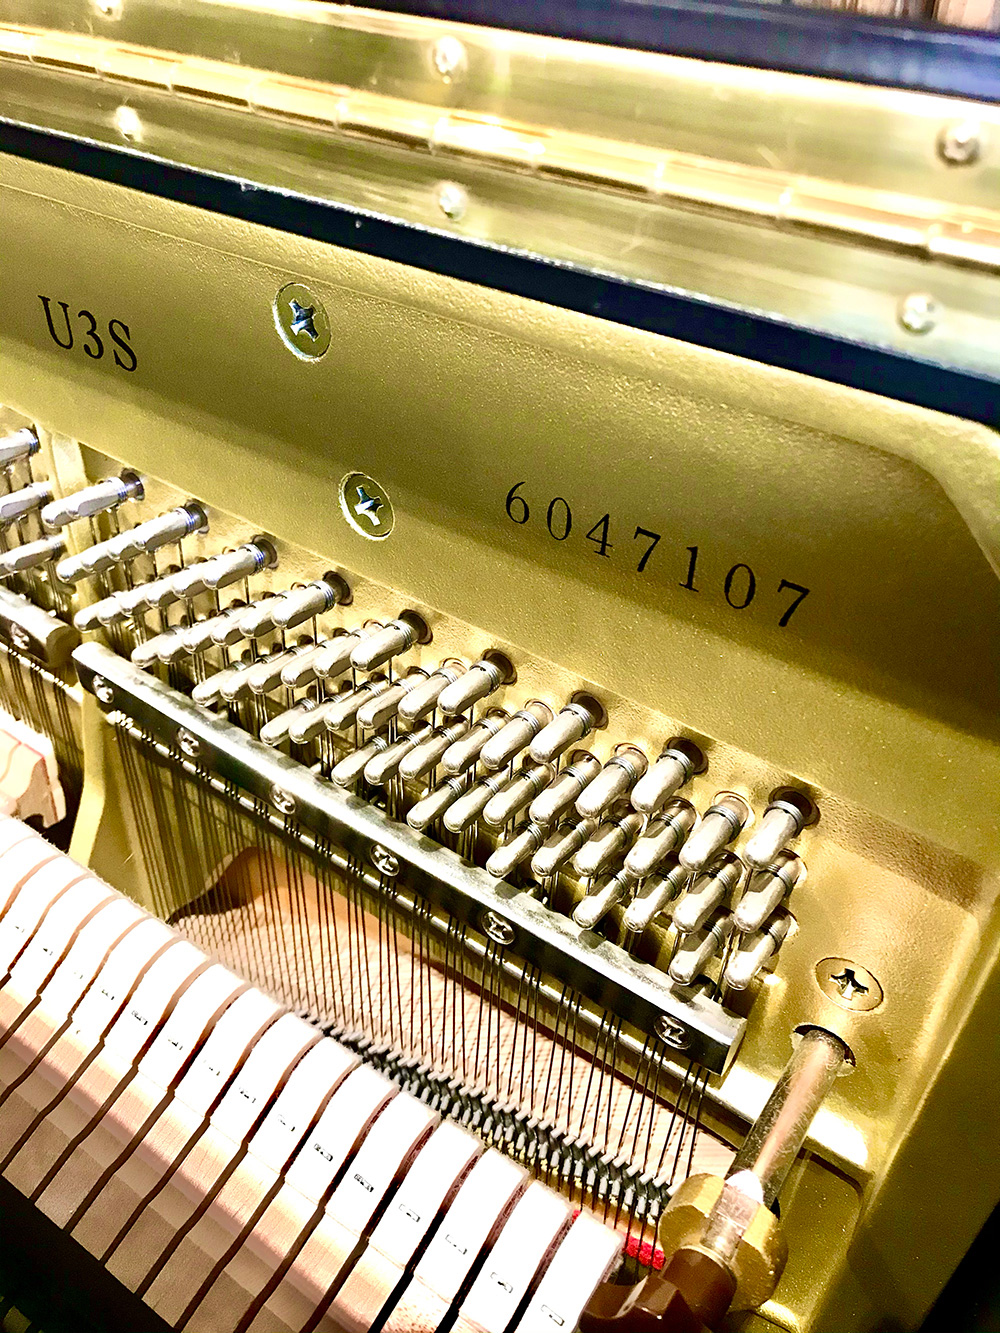 Yamaha-U3S-Piano-Dorset-4.jpg